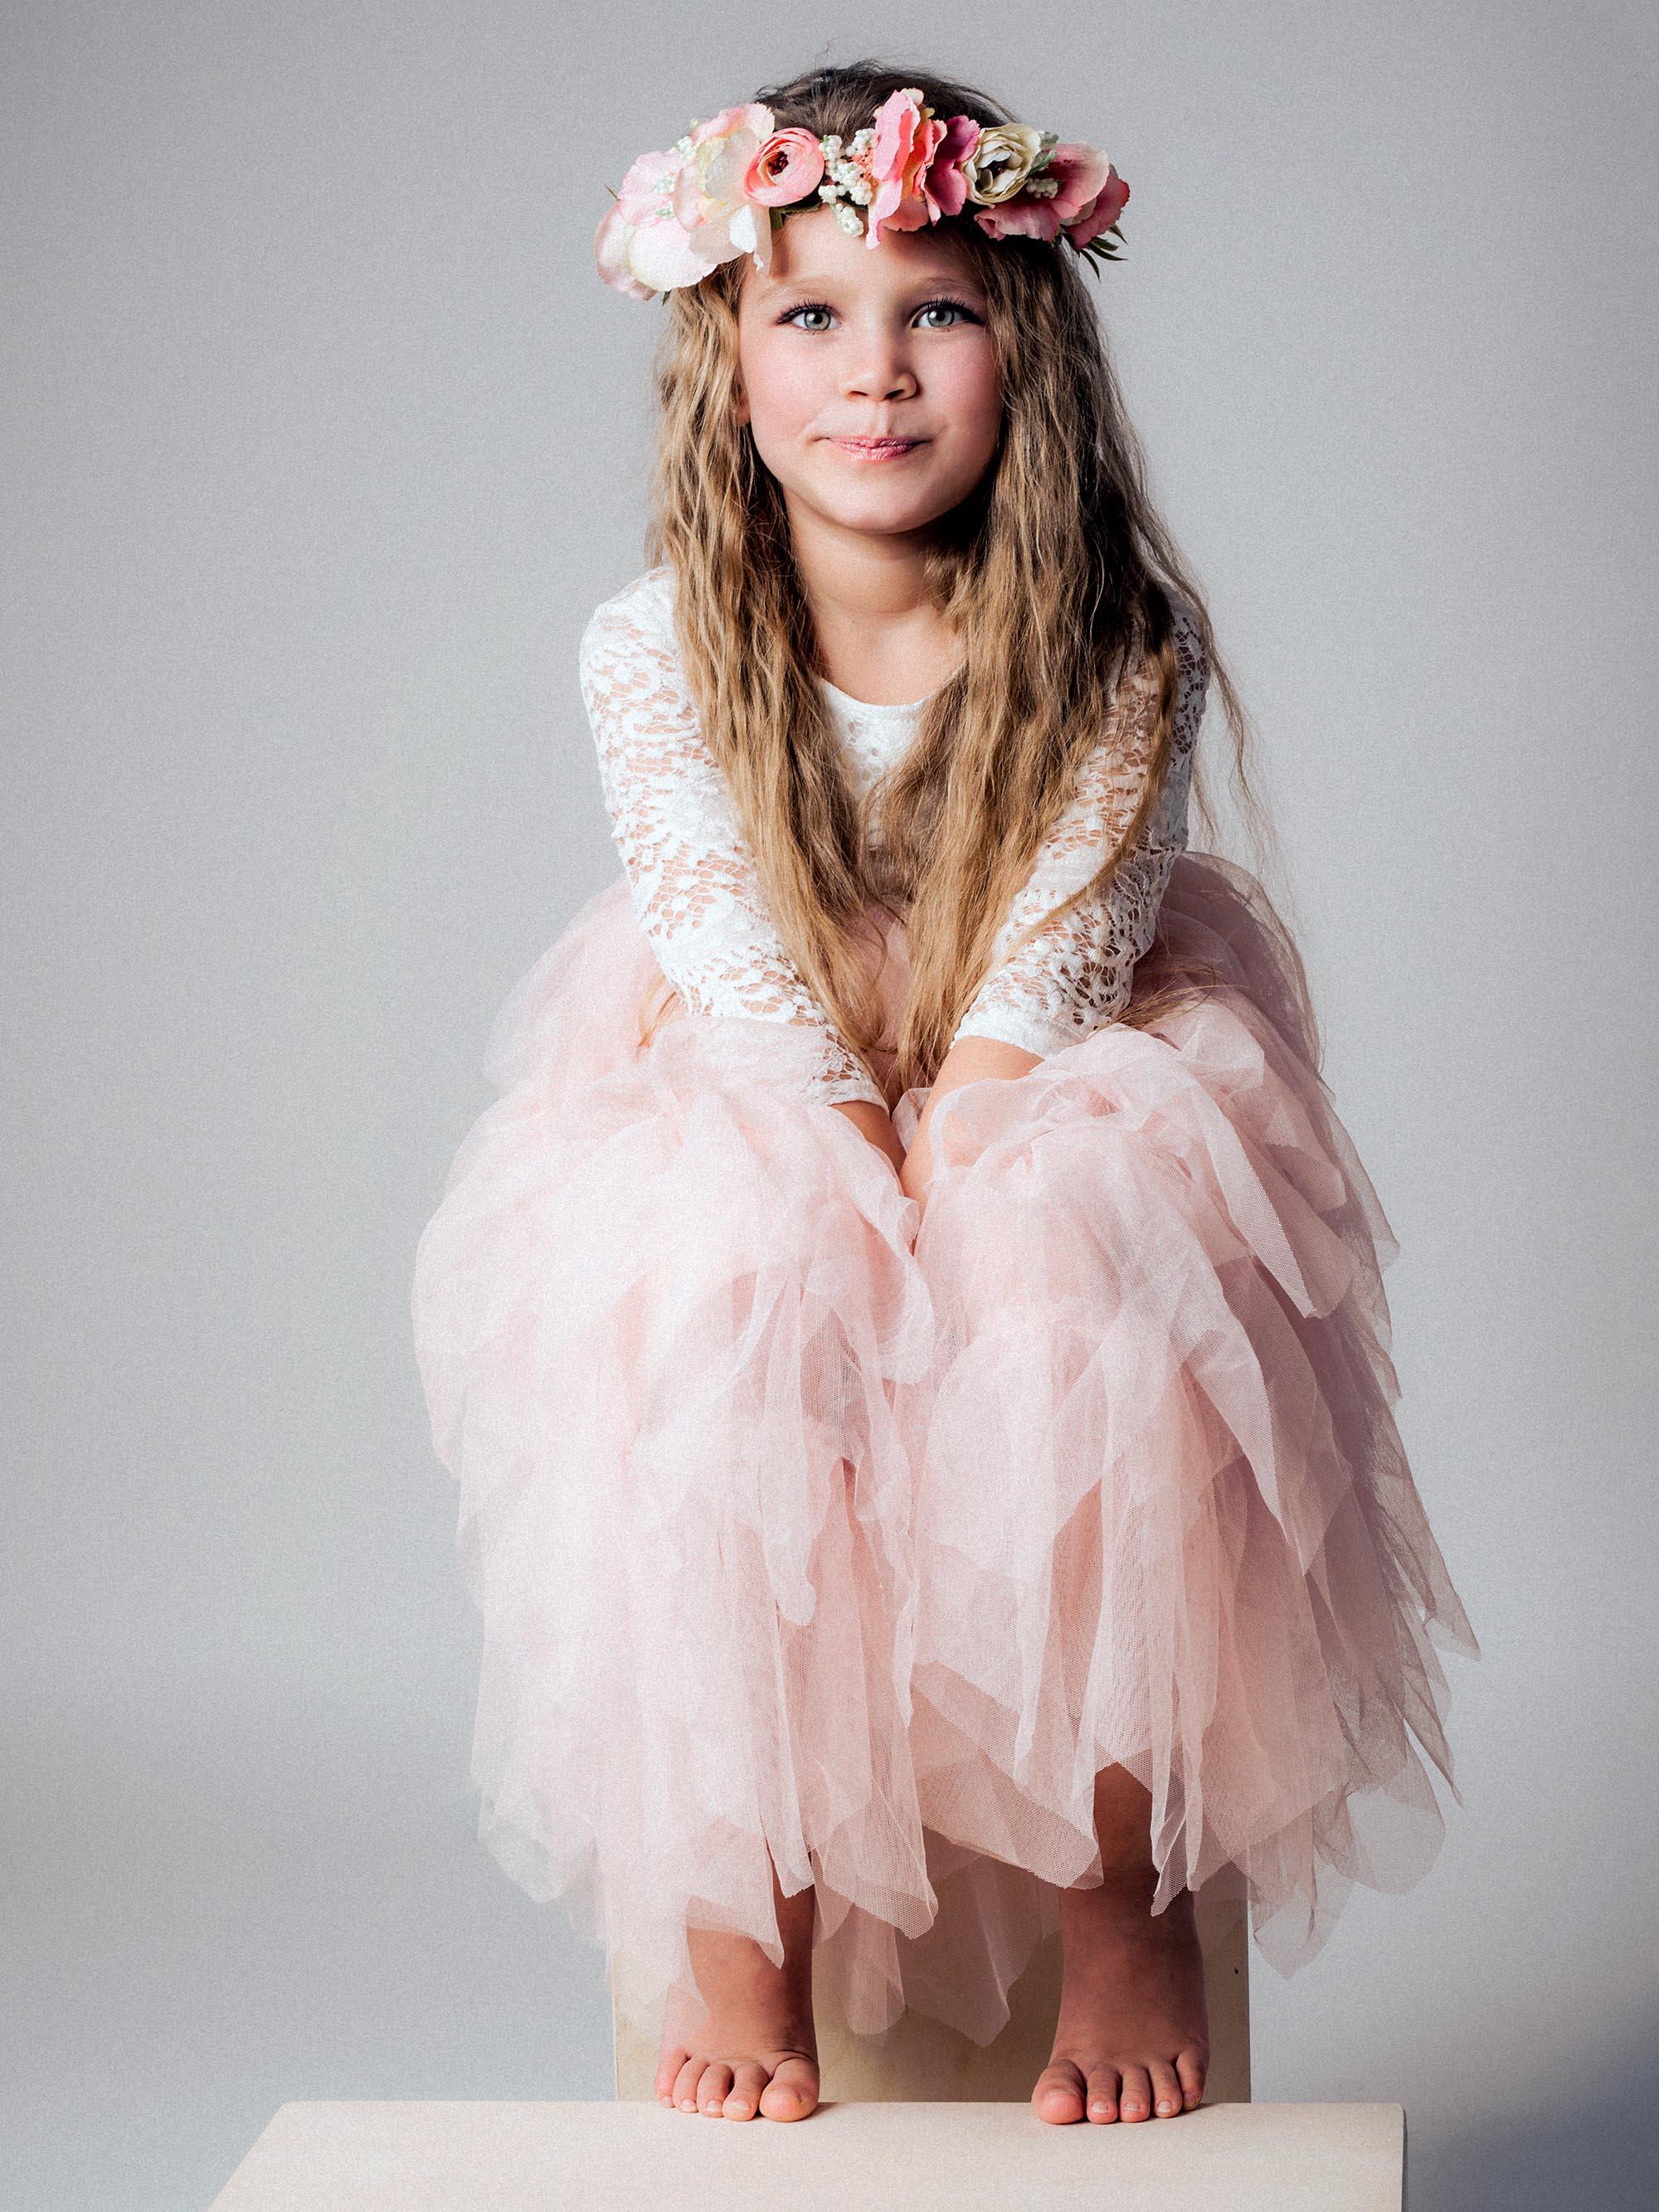 nyc-photographers-kids-modeling-10026.jpg